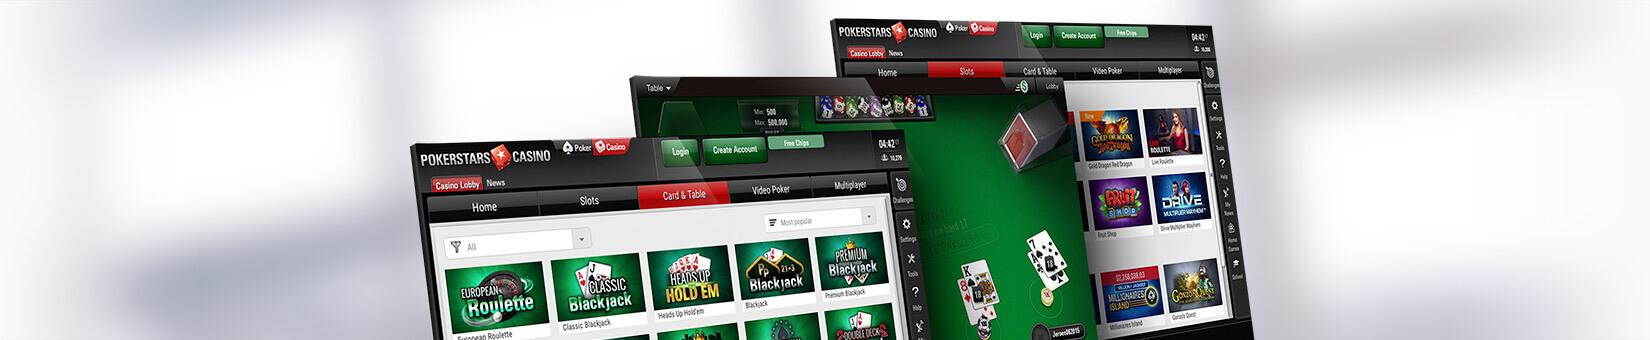 Lincecia EU casino pokerstars dinero real-728012